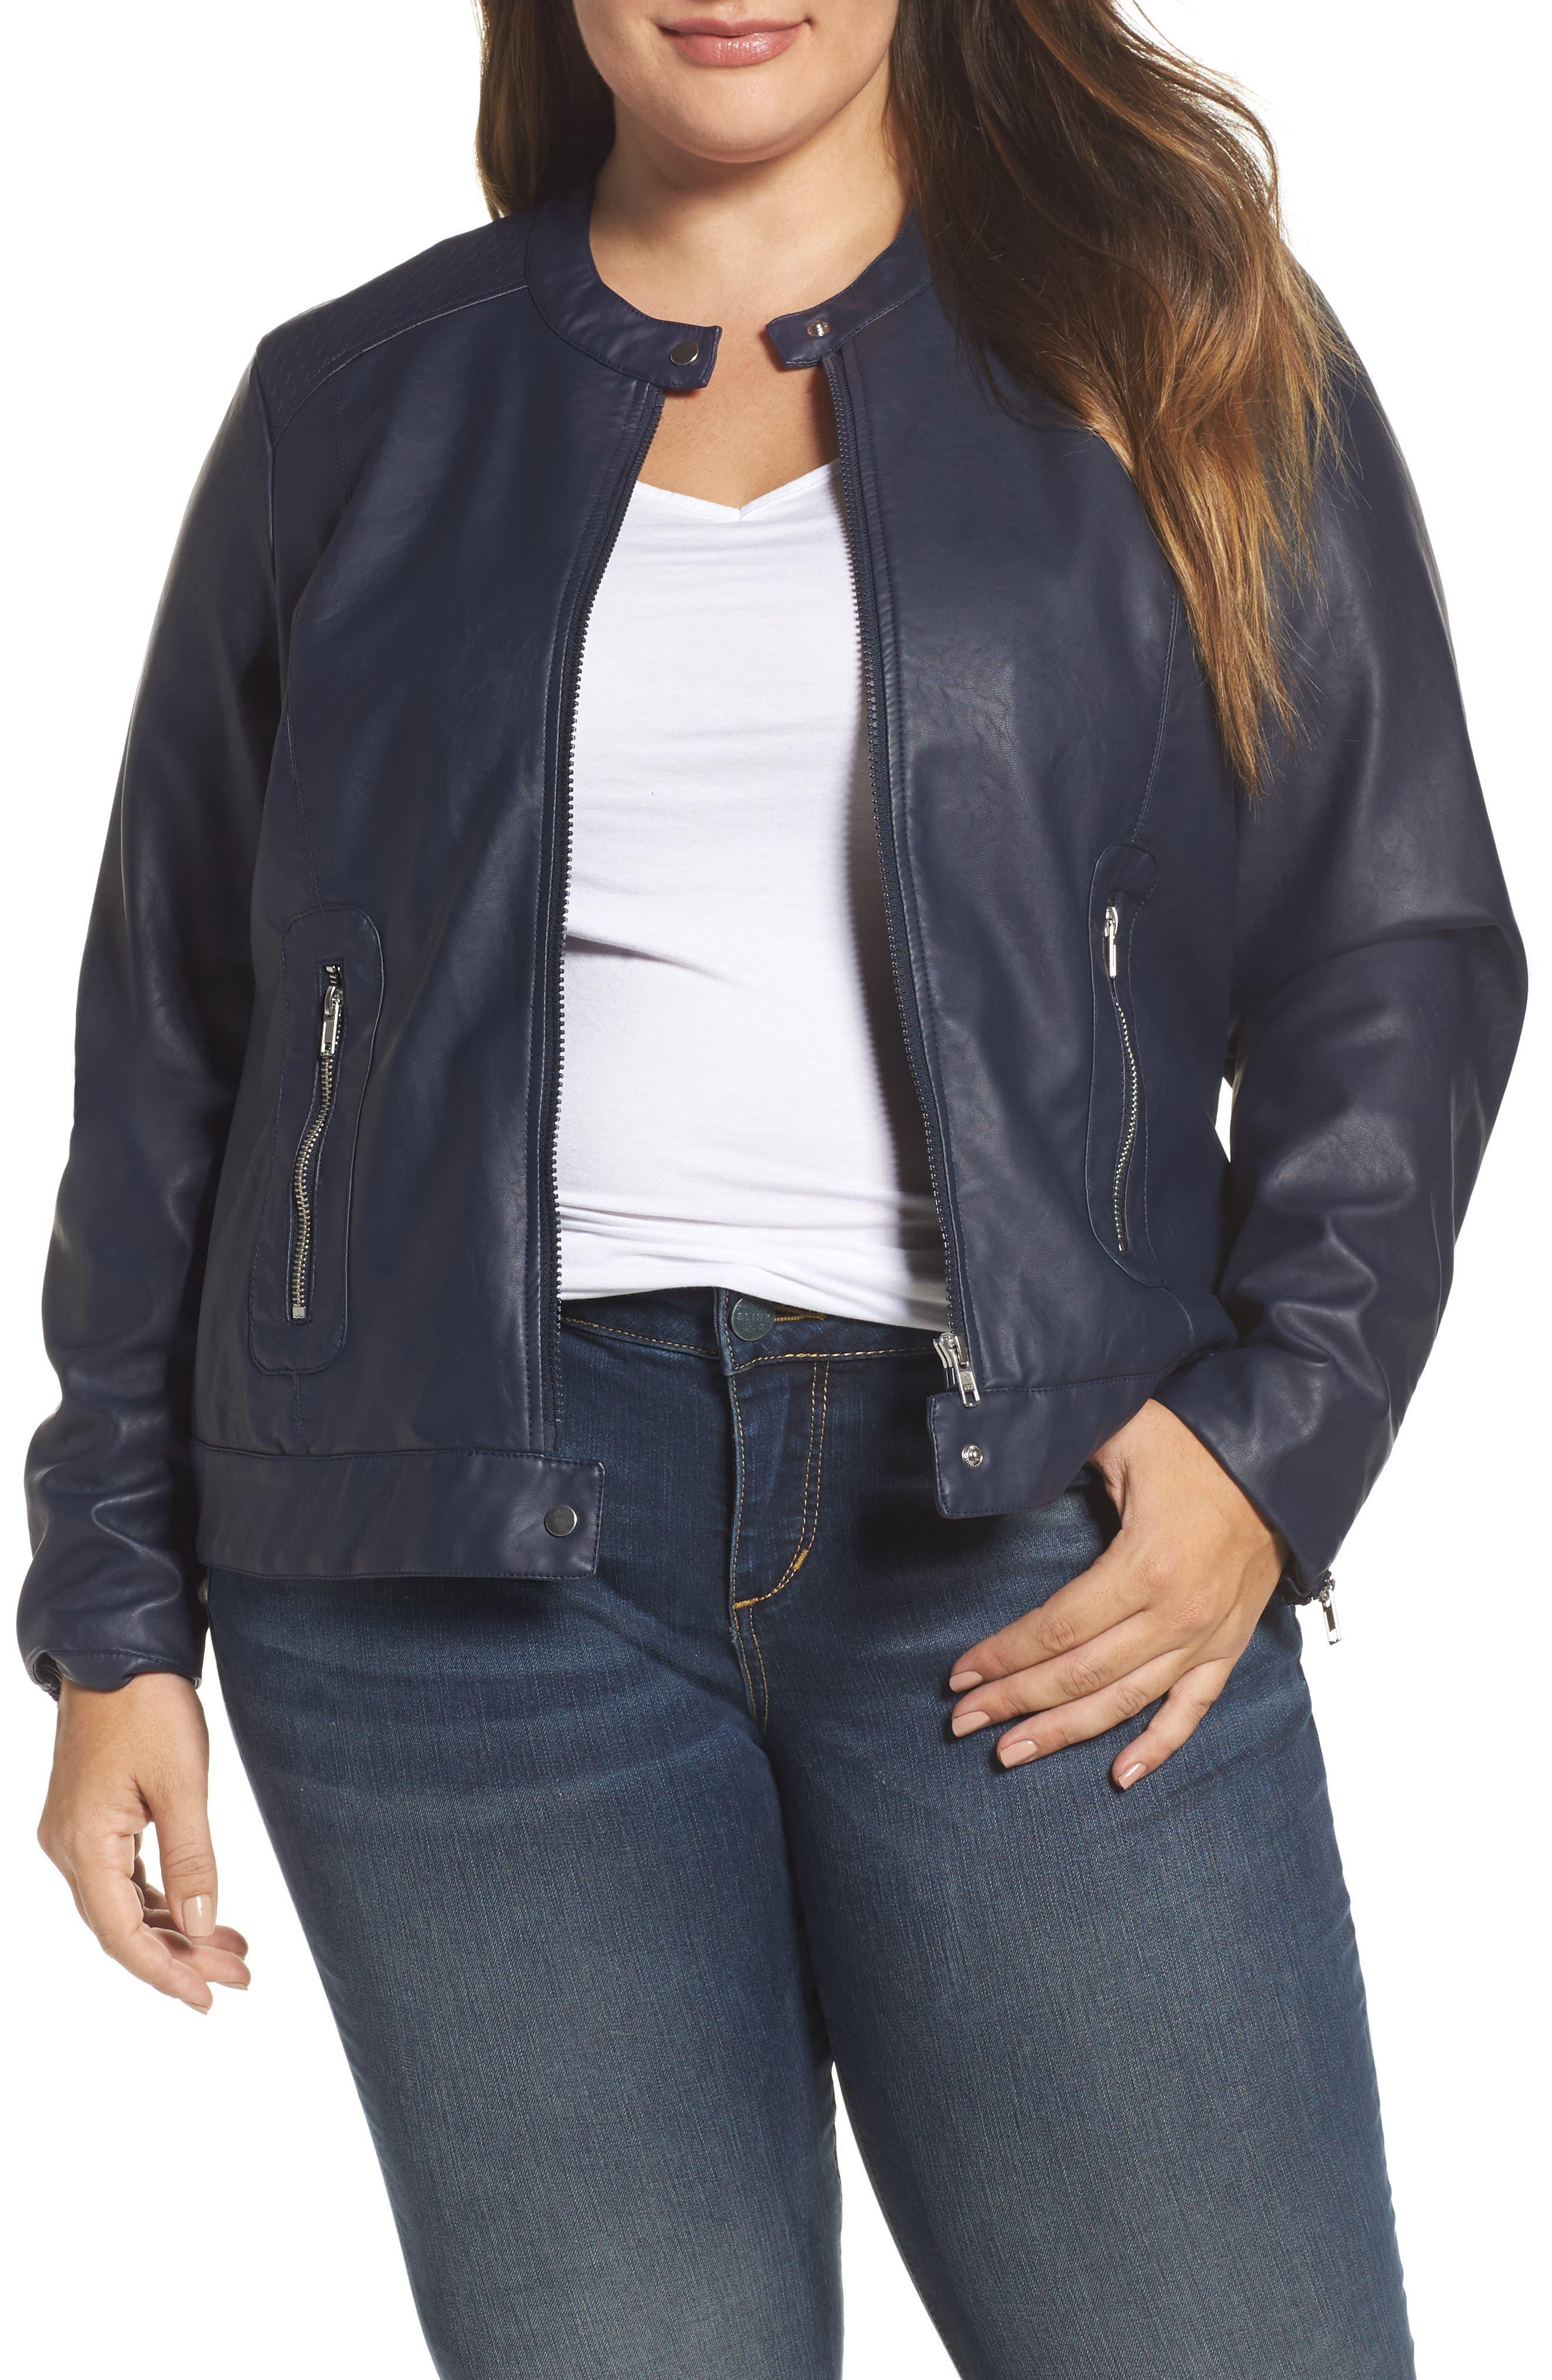 Vava Faux Leather Moto Jacket,                         Main,                         color, 411